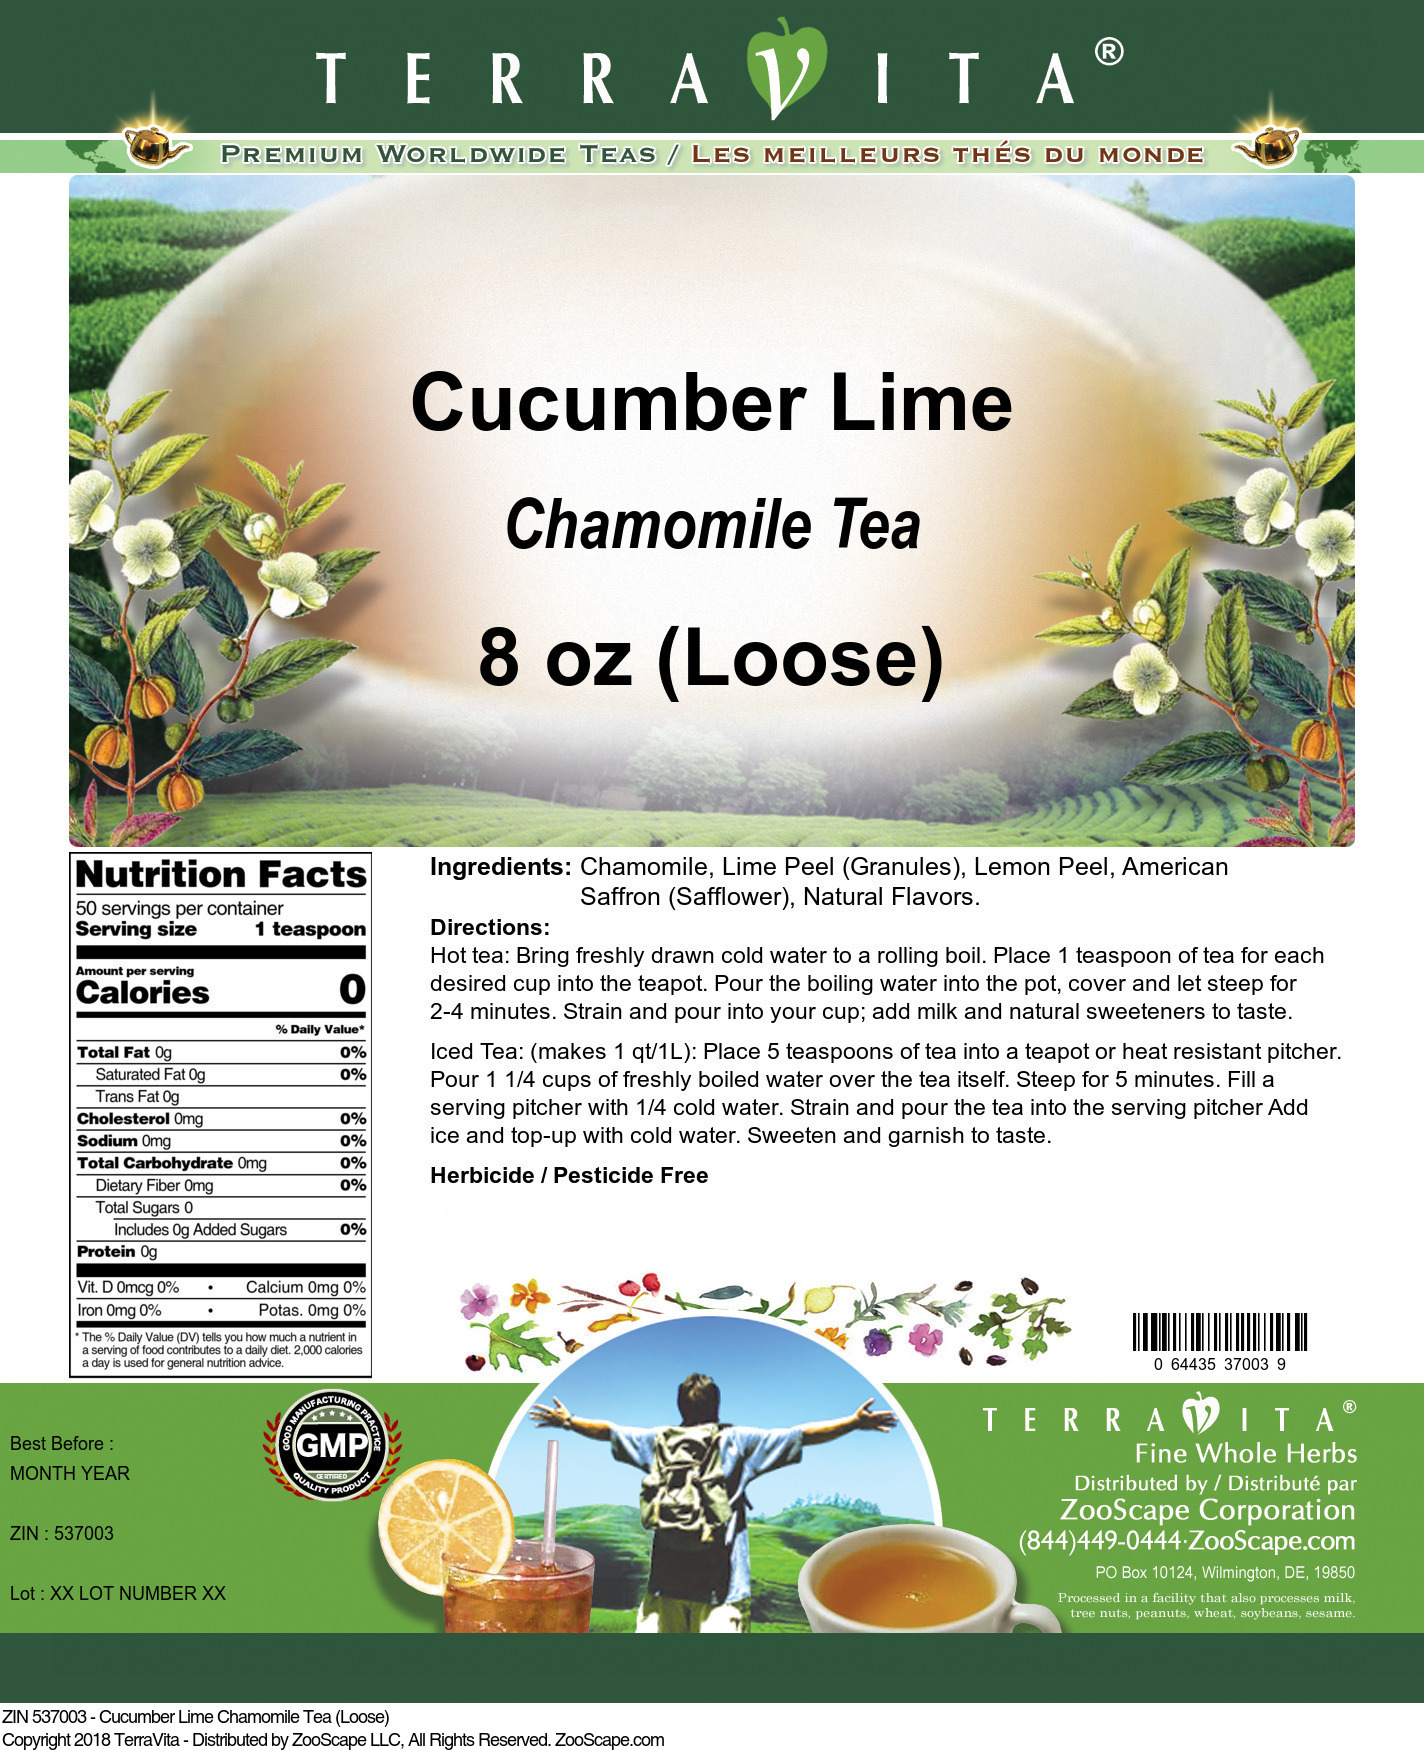 Cucumber Lime Chamomile Tea (Loose)